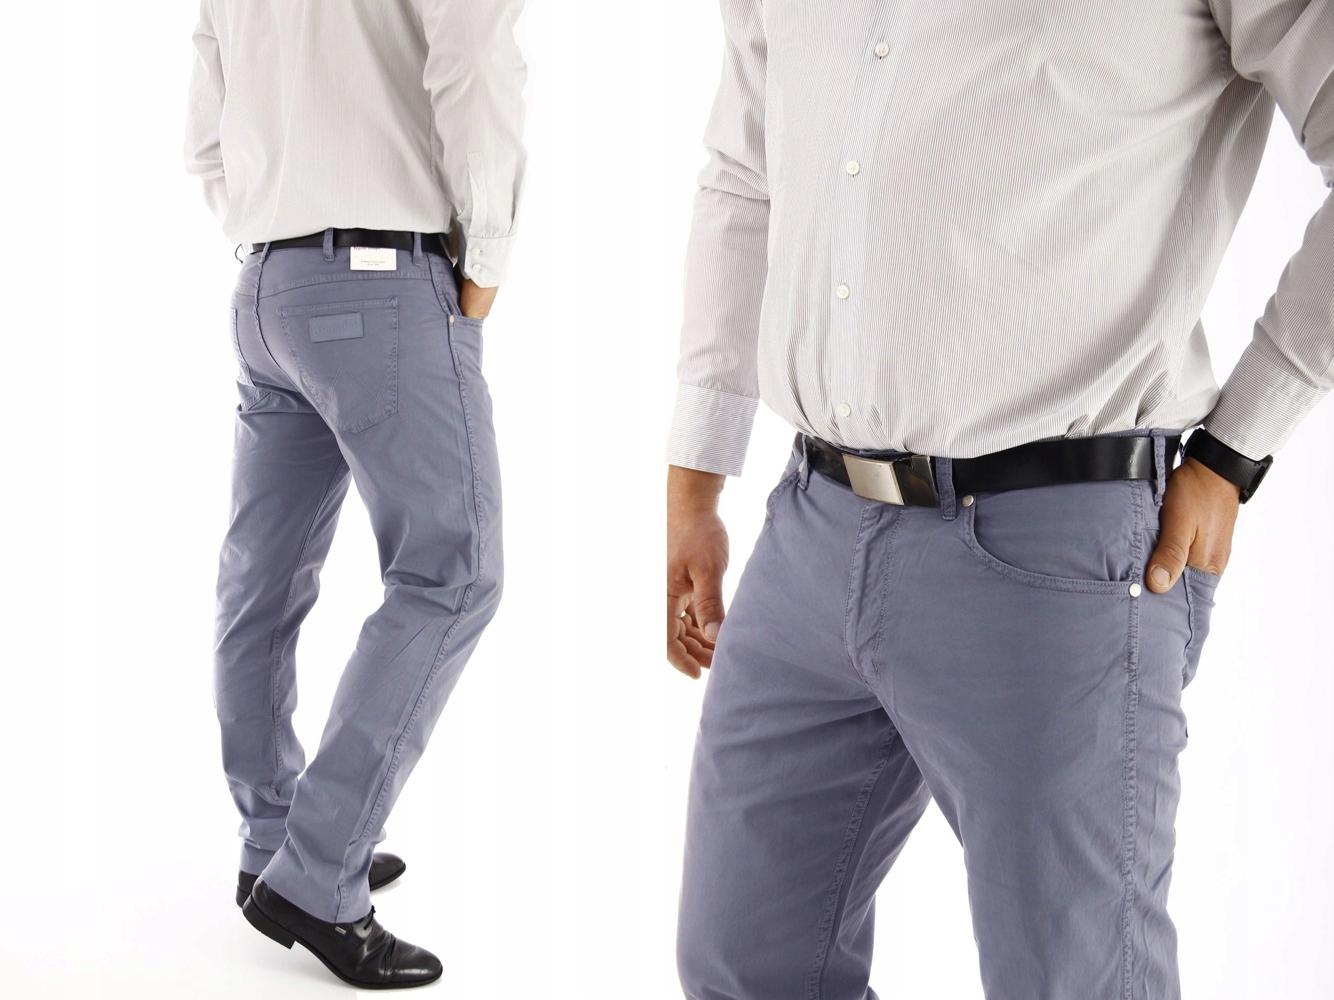 Wrangler Greensboro Flinston Blue spodnie W36 L34